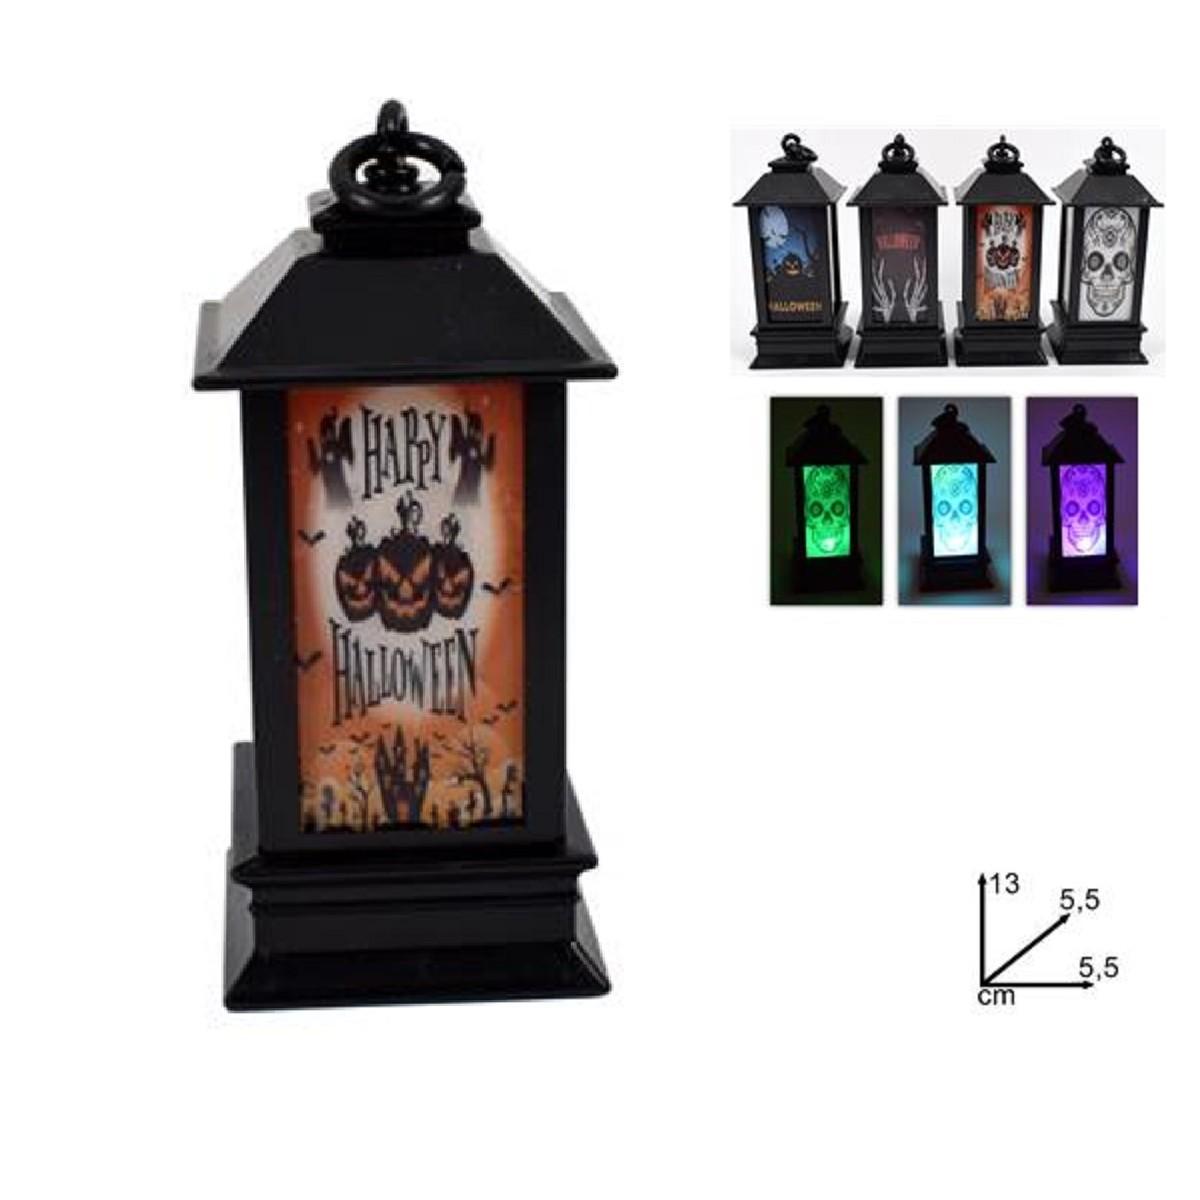 Lanterna luminosa Halloween 13cm v. modelli